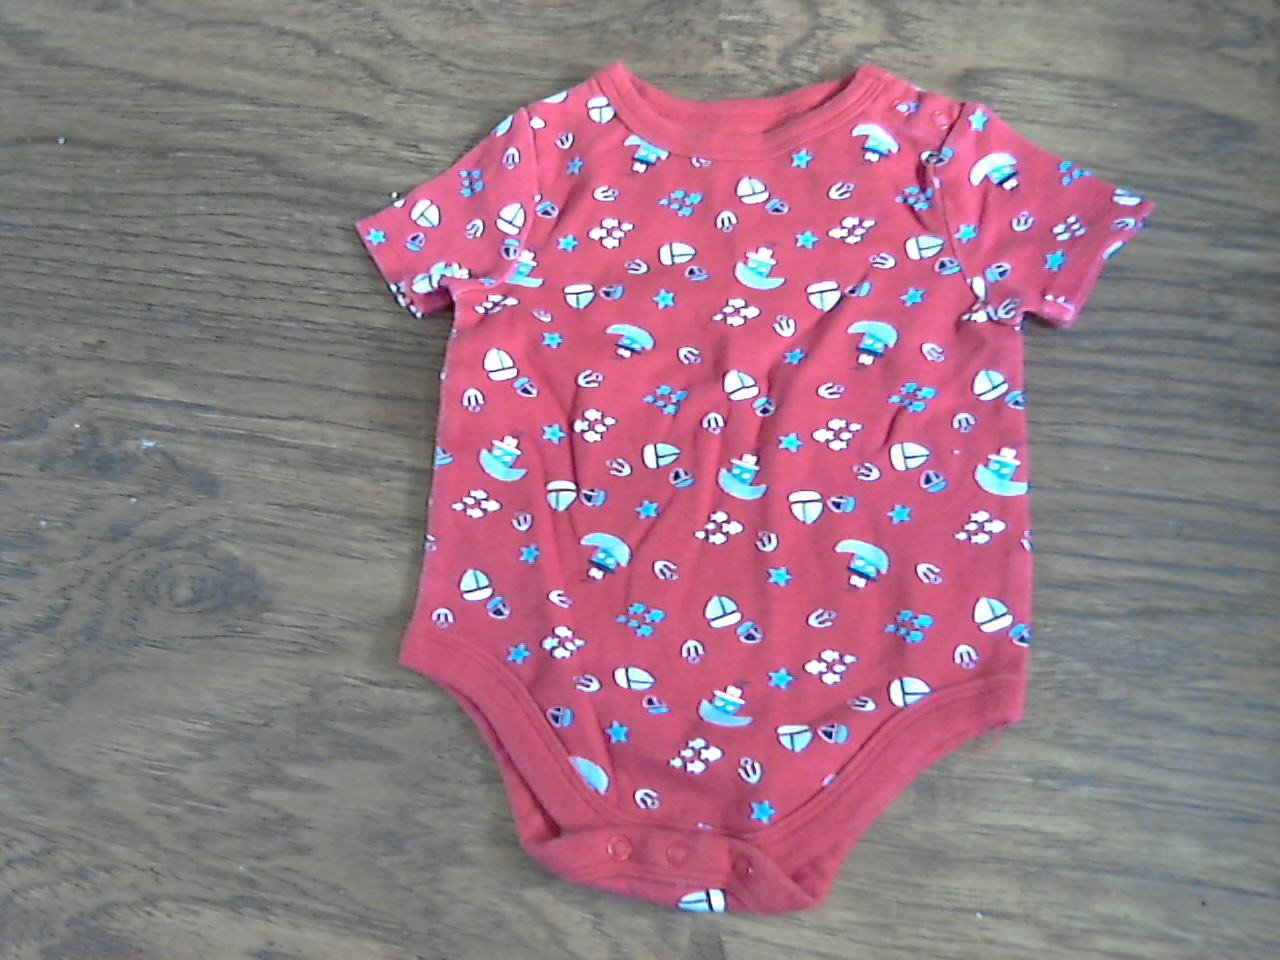 Garanimals baby boy's red short sleeve bodysuit 3-6 mos